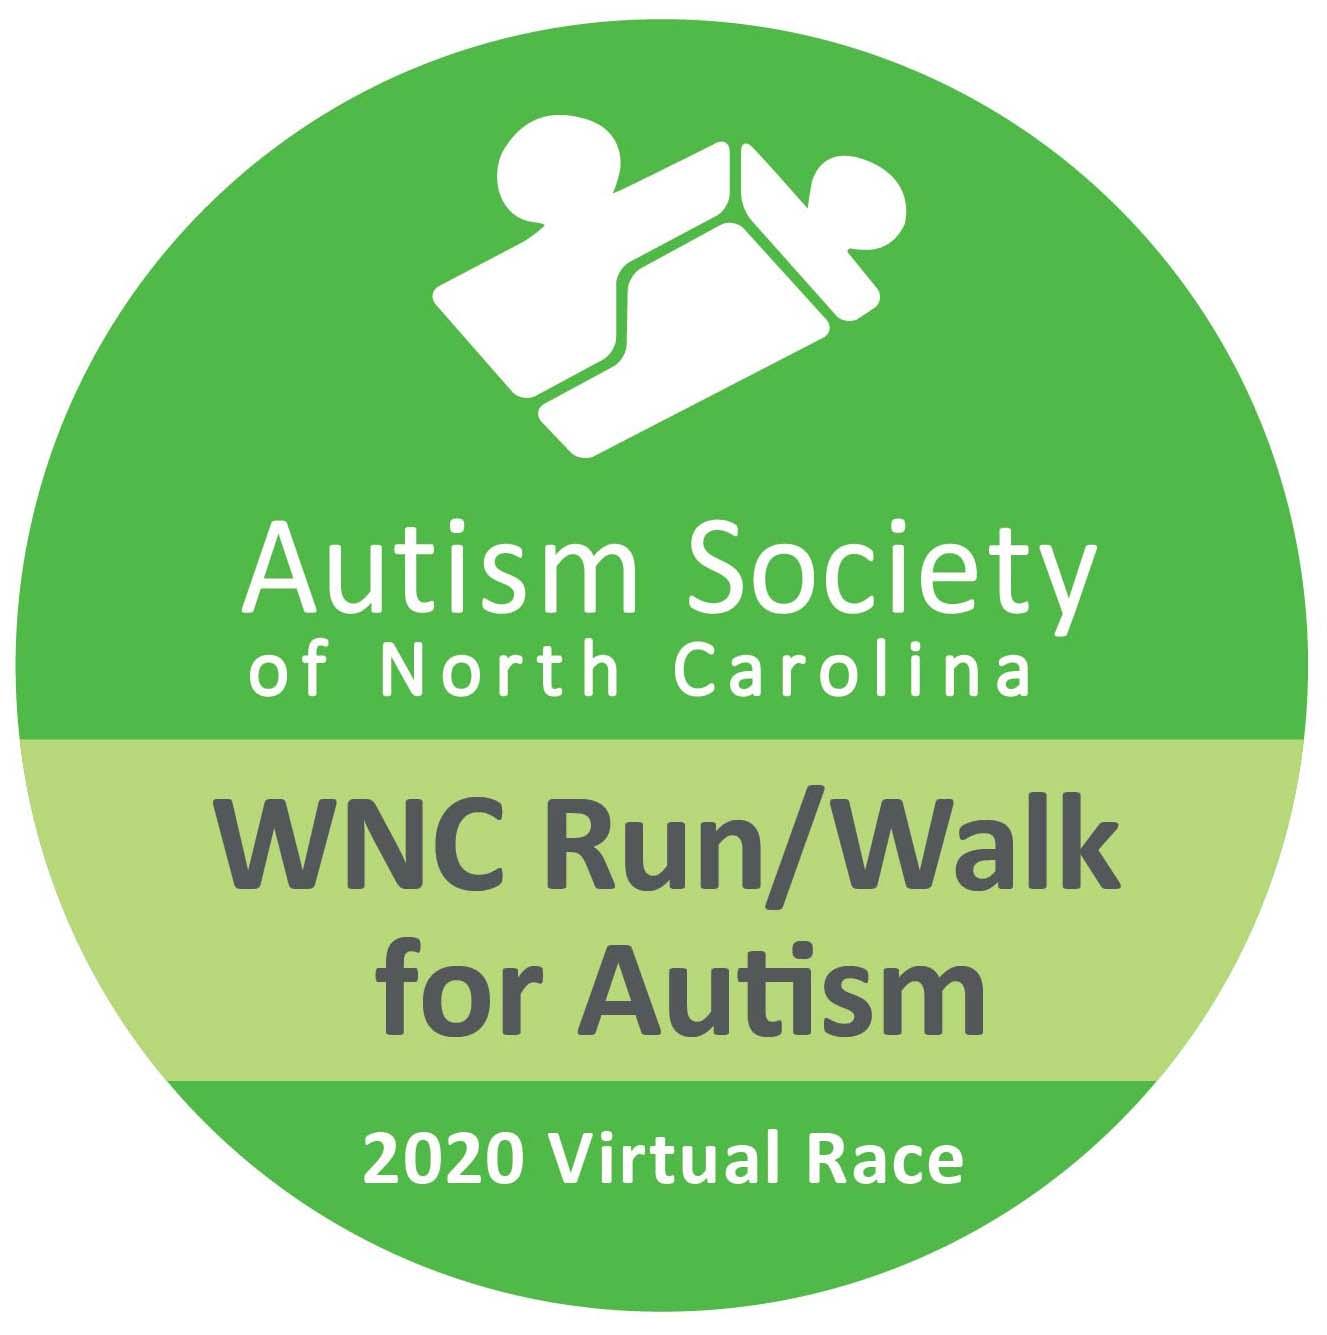 2020 Virtual WNC Run/Walk for Autism